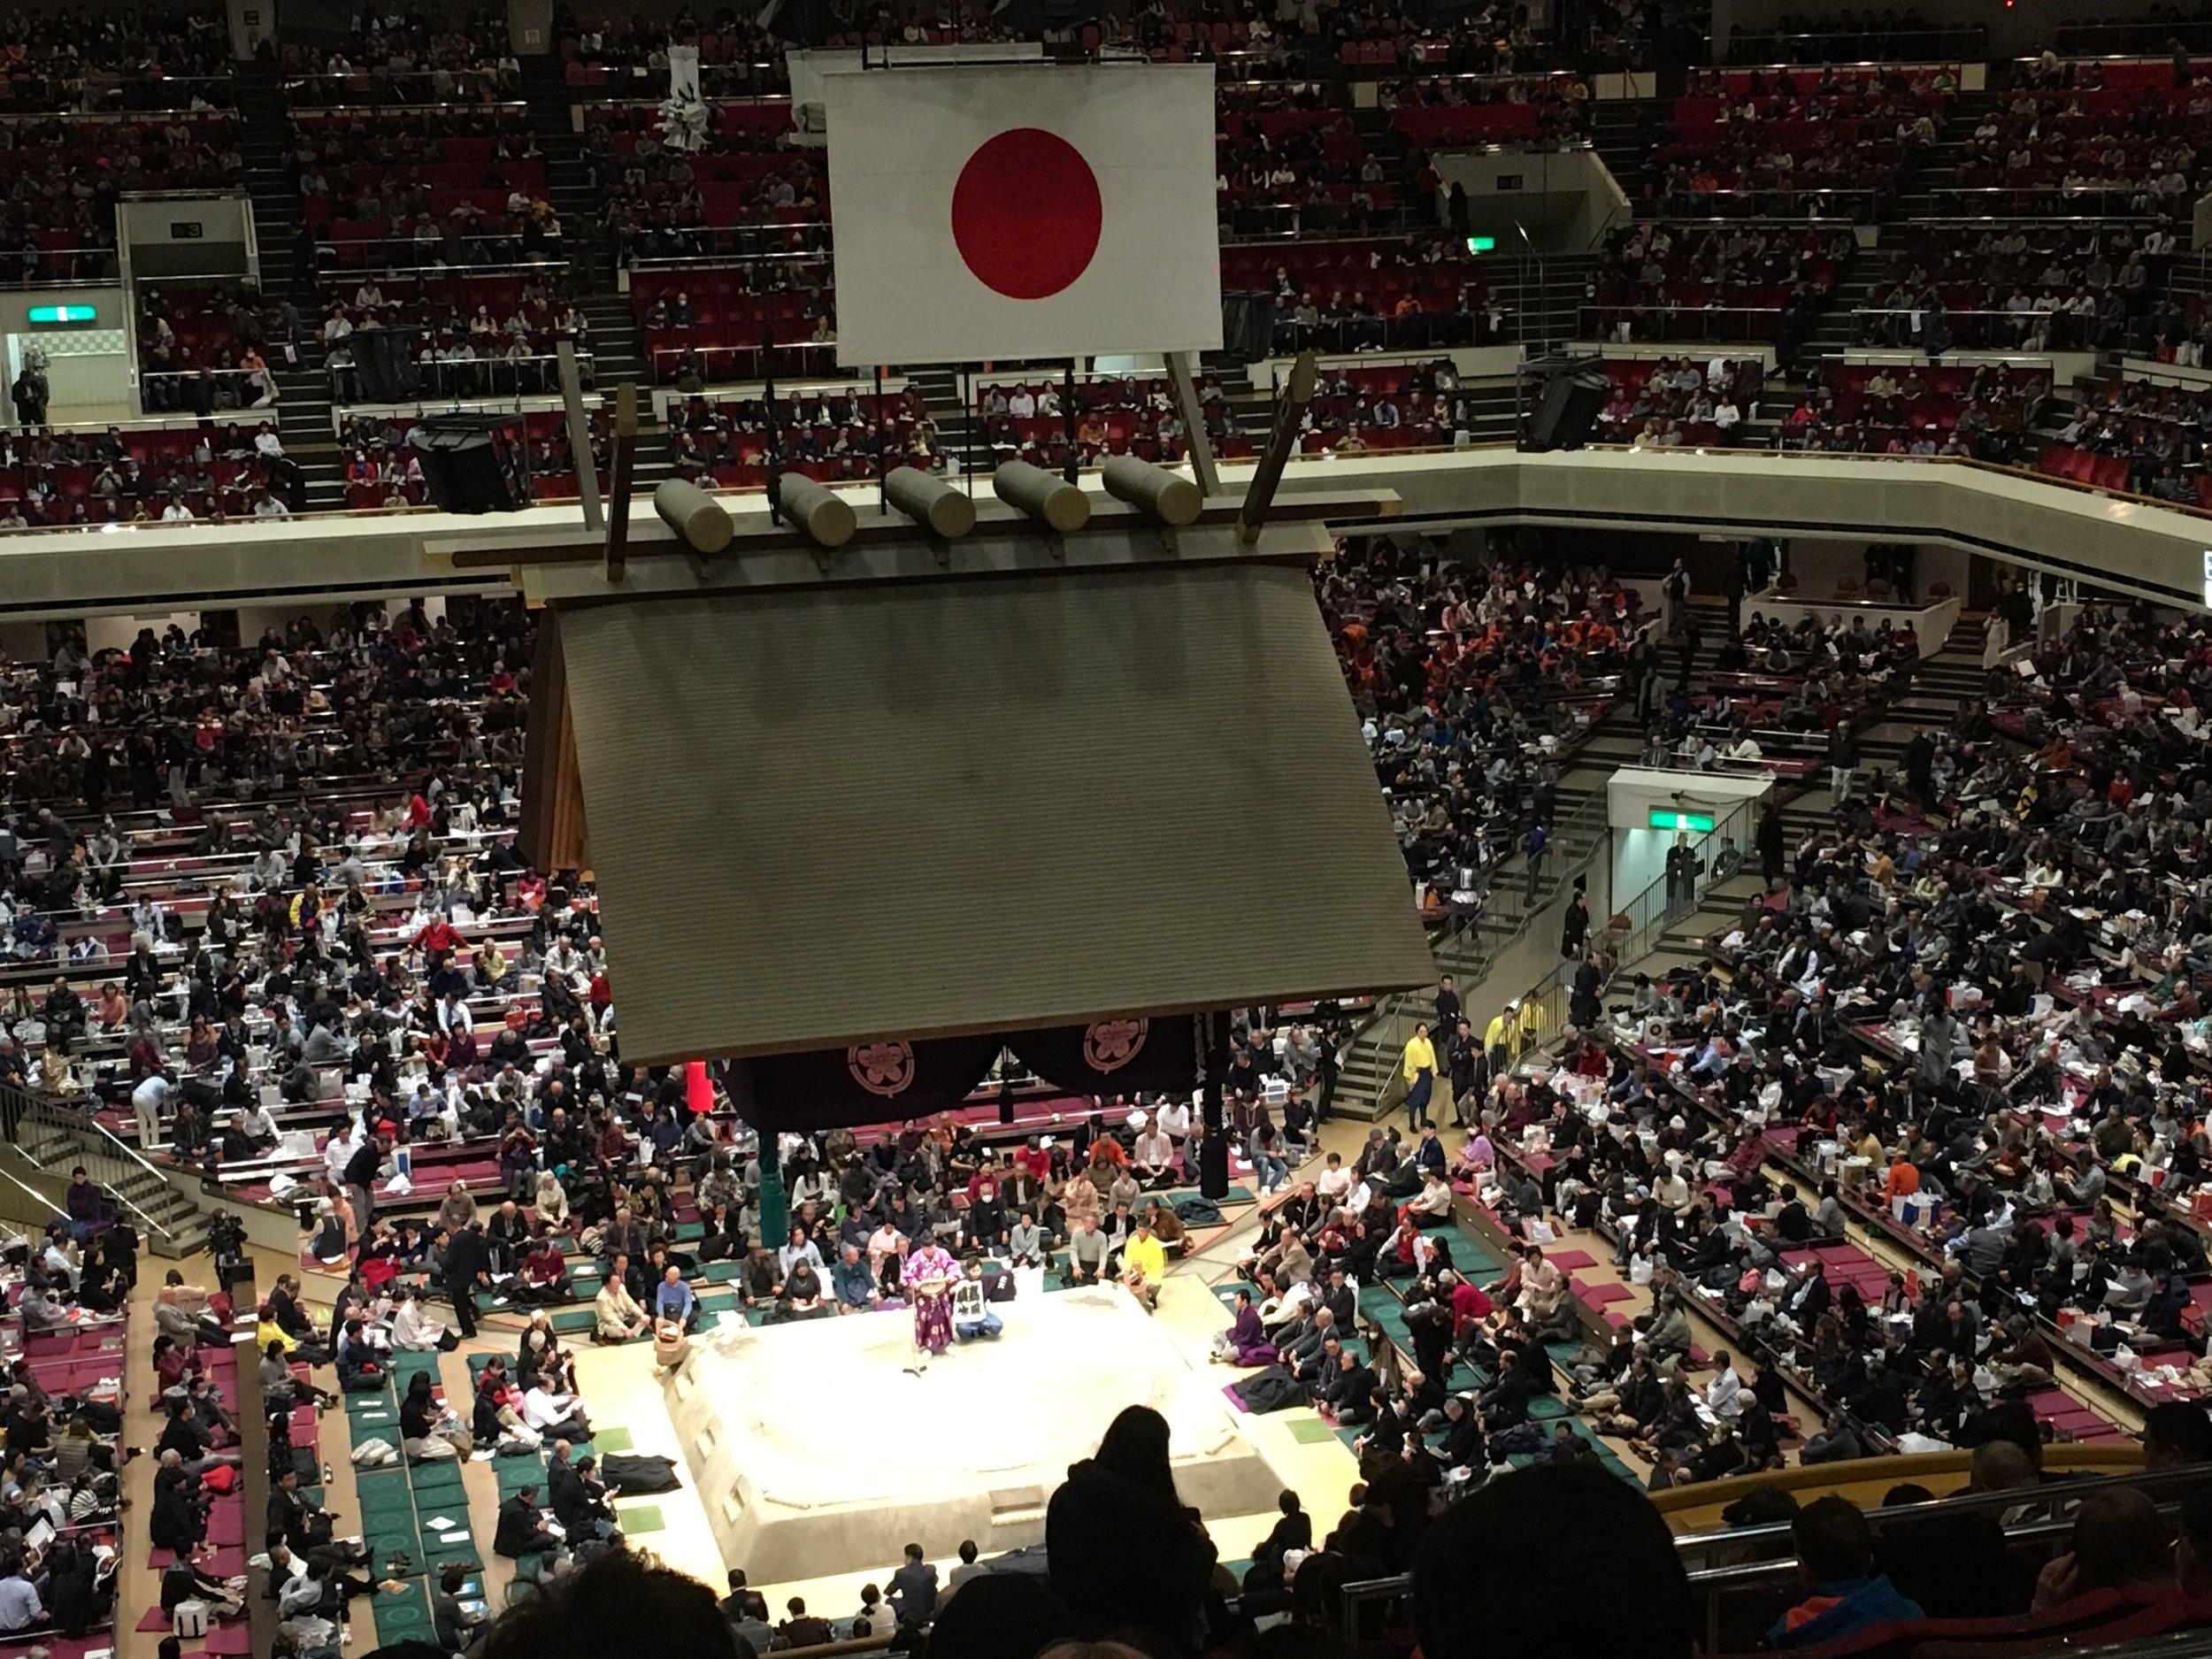 View of the sumo ring in the Ryogoku Kokugaikan, Tokyo.